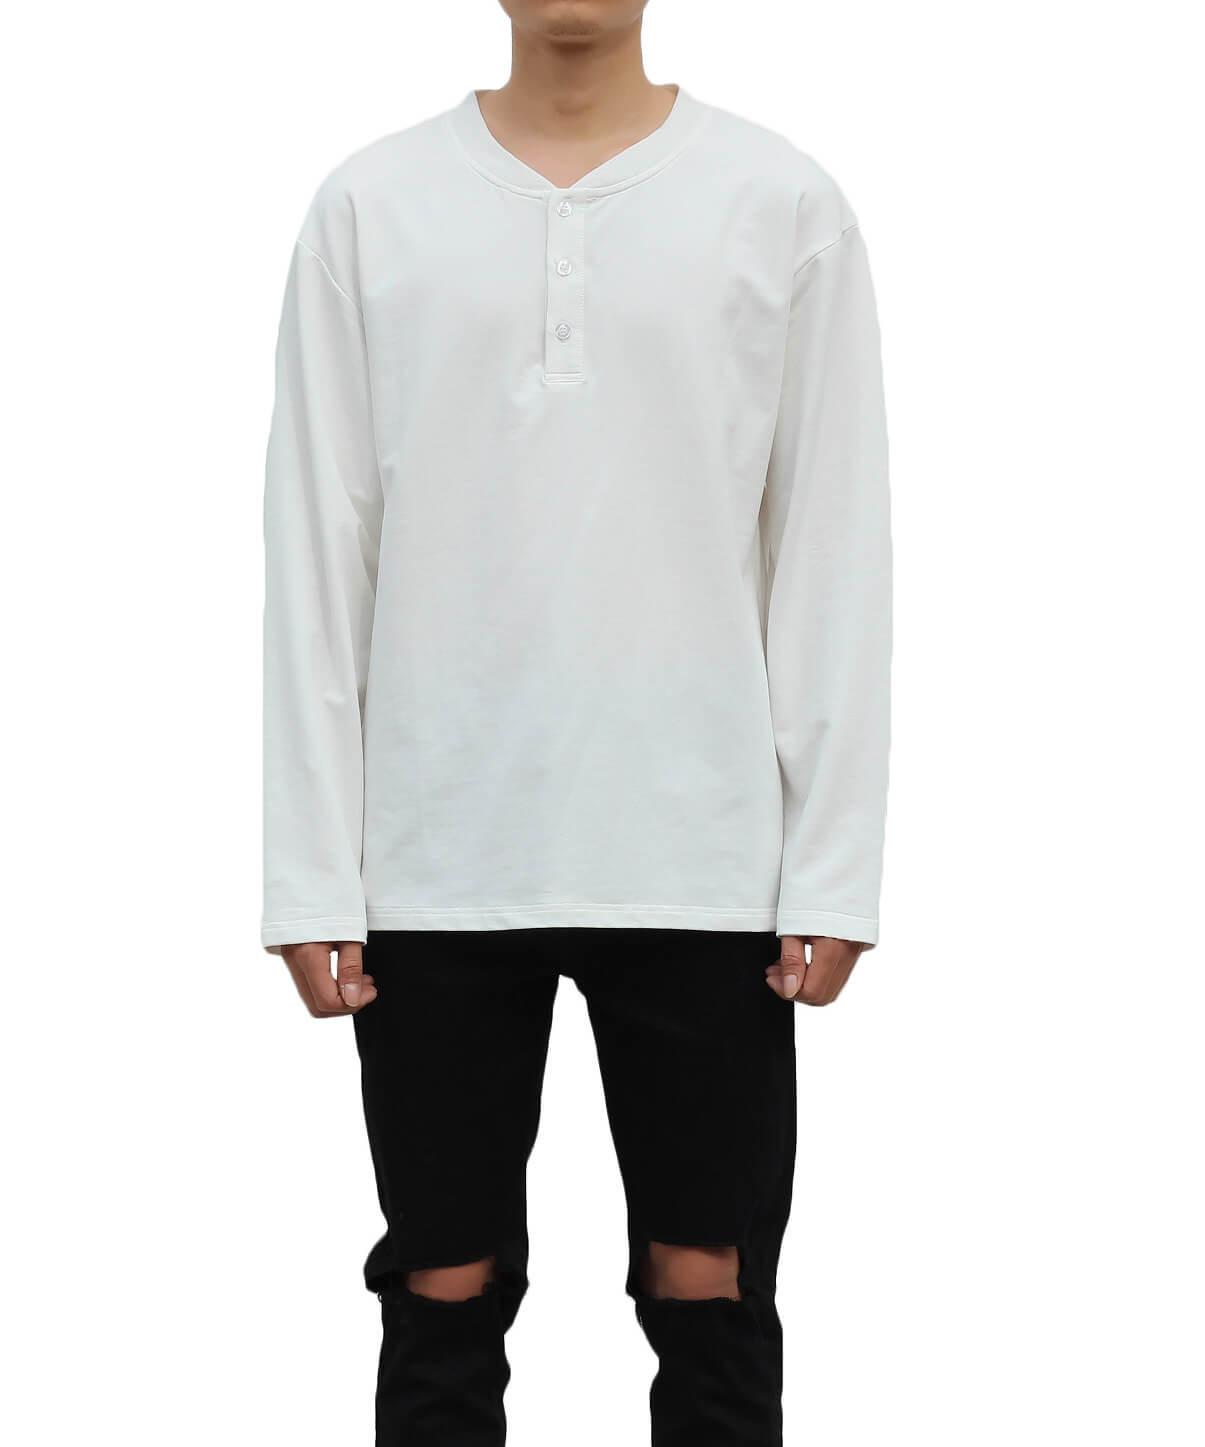 Light Terry  Long Sleeve T-Shirt - Ivory